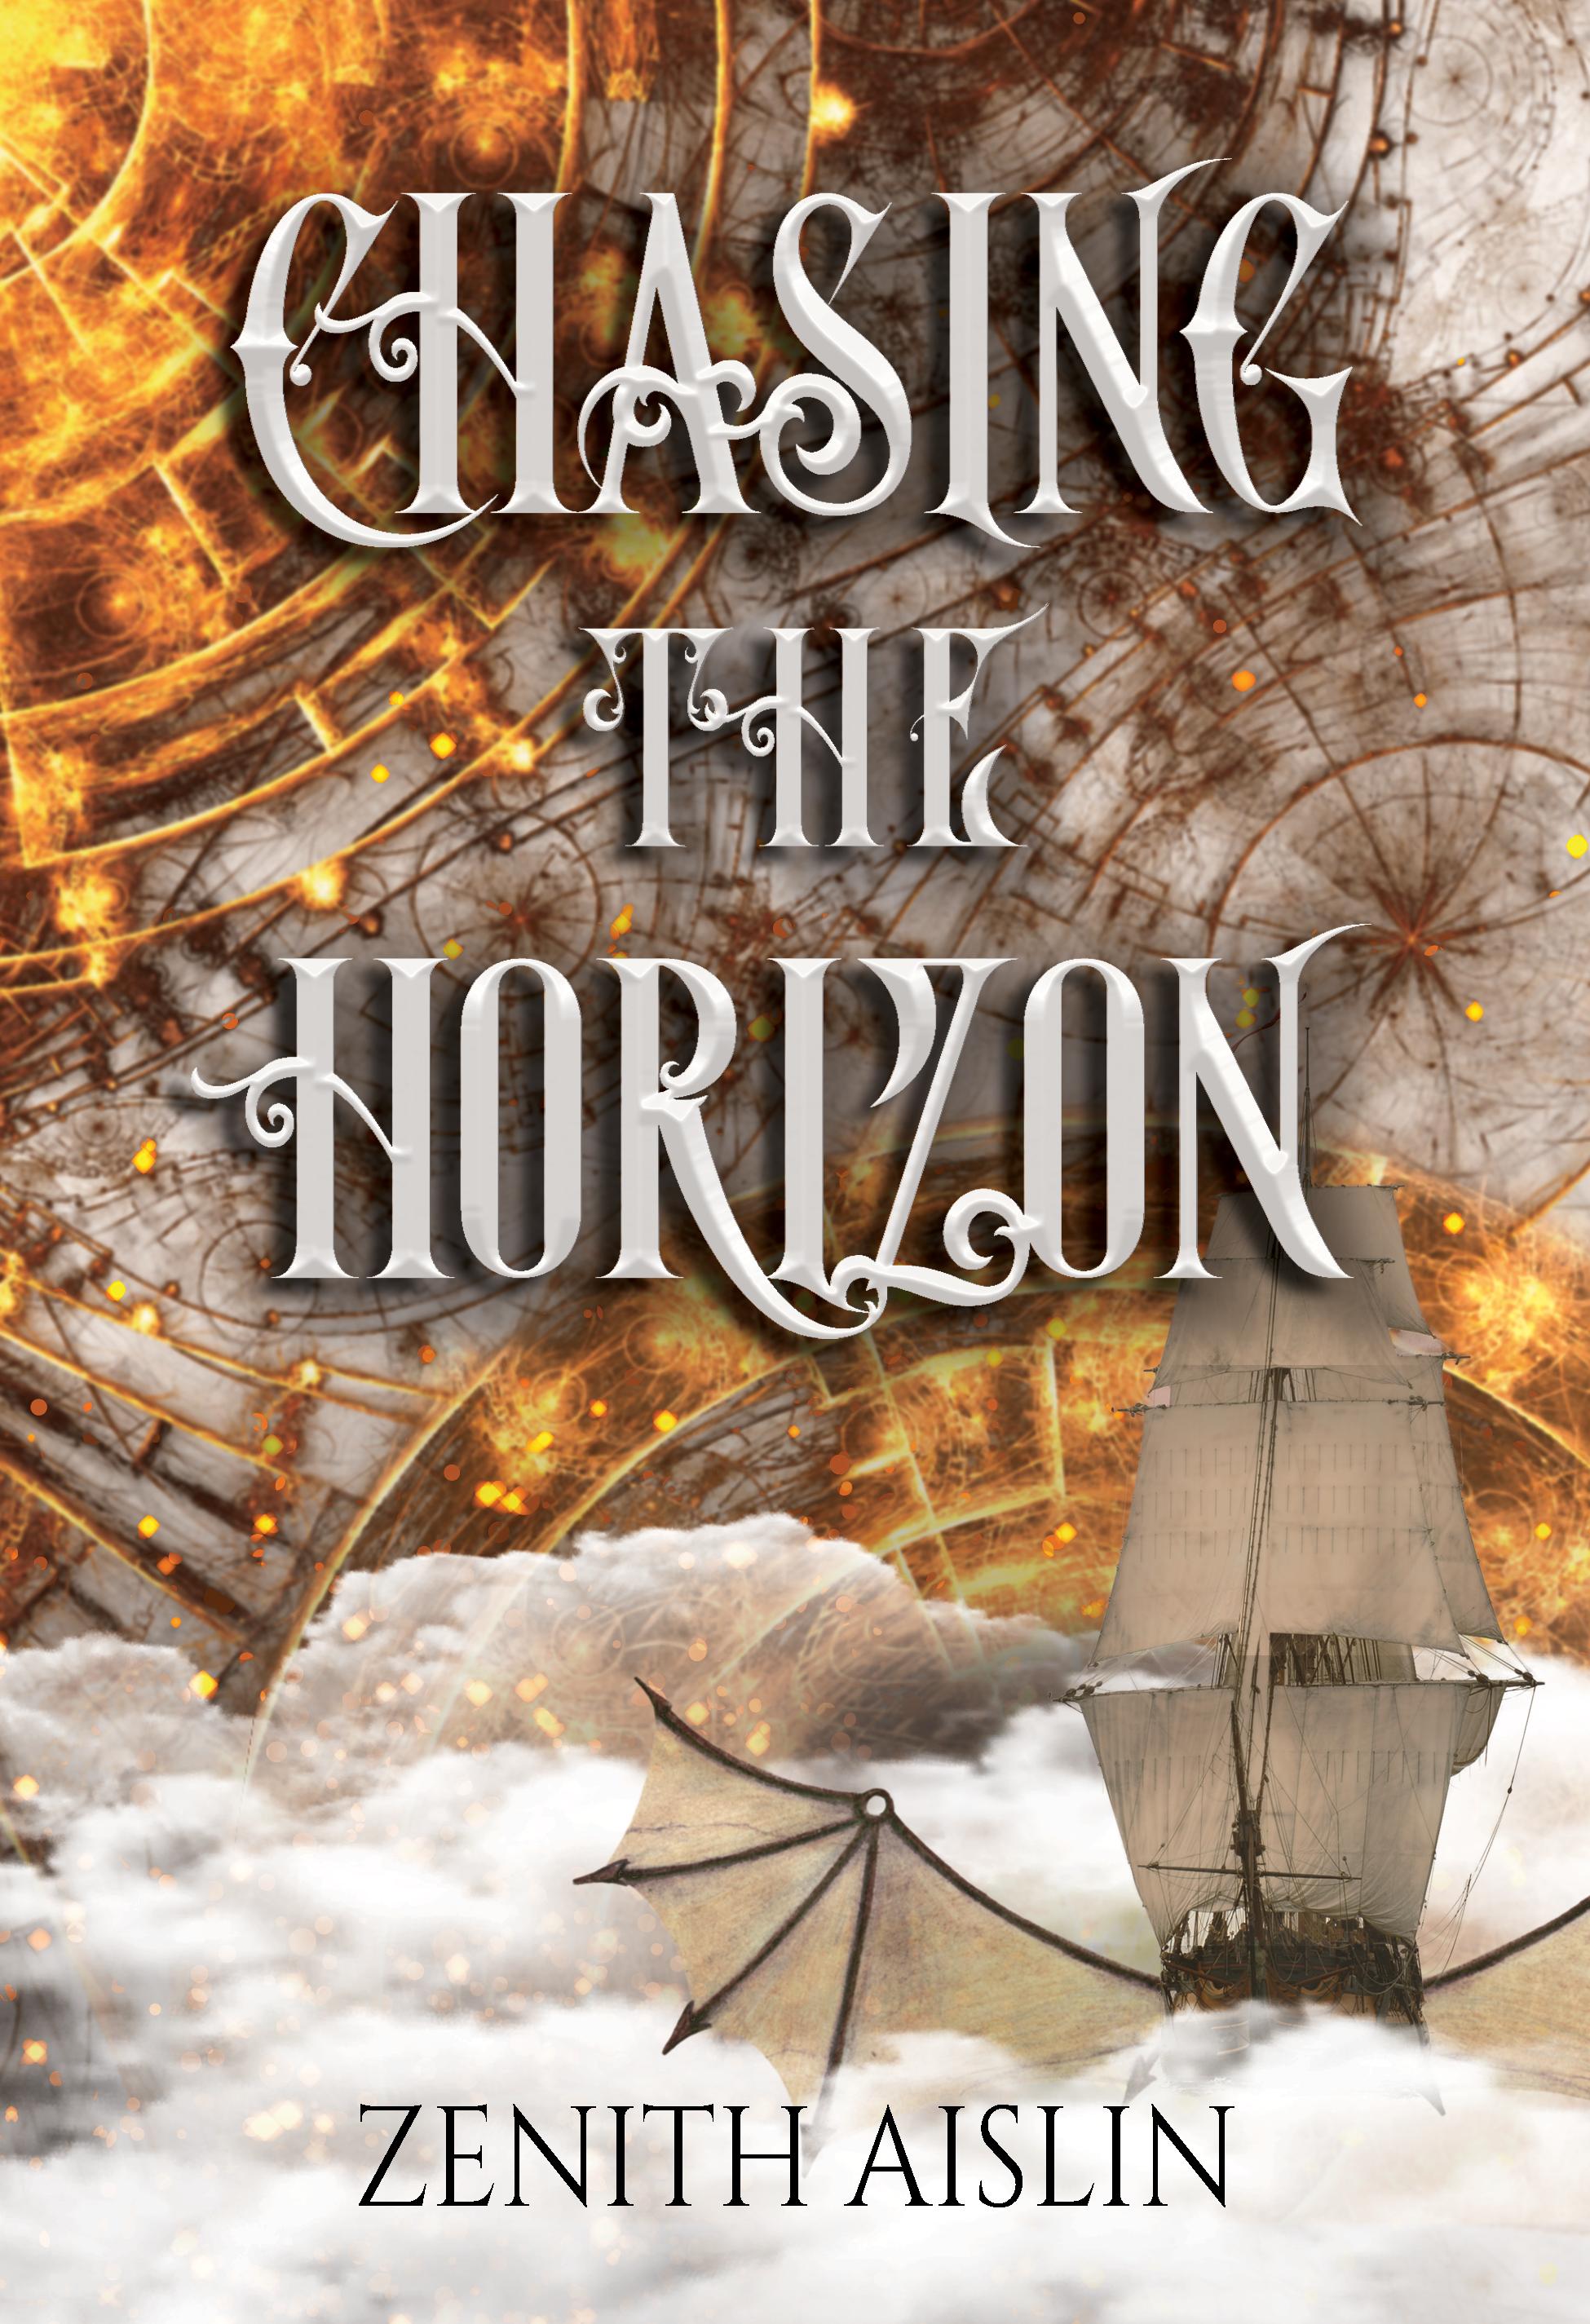 chasing-the-horizon-v6